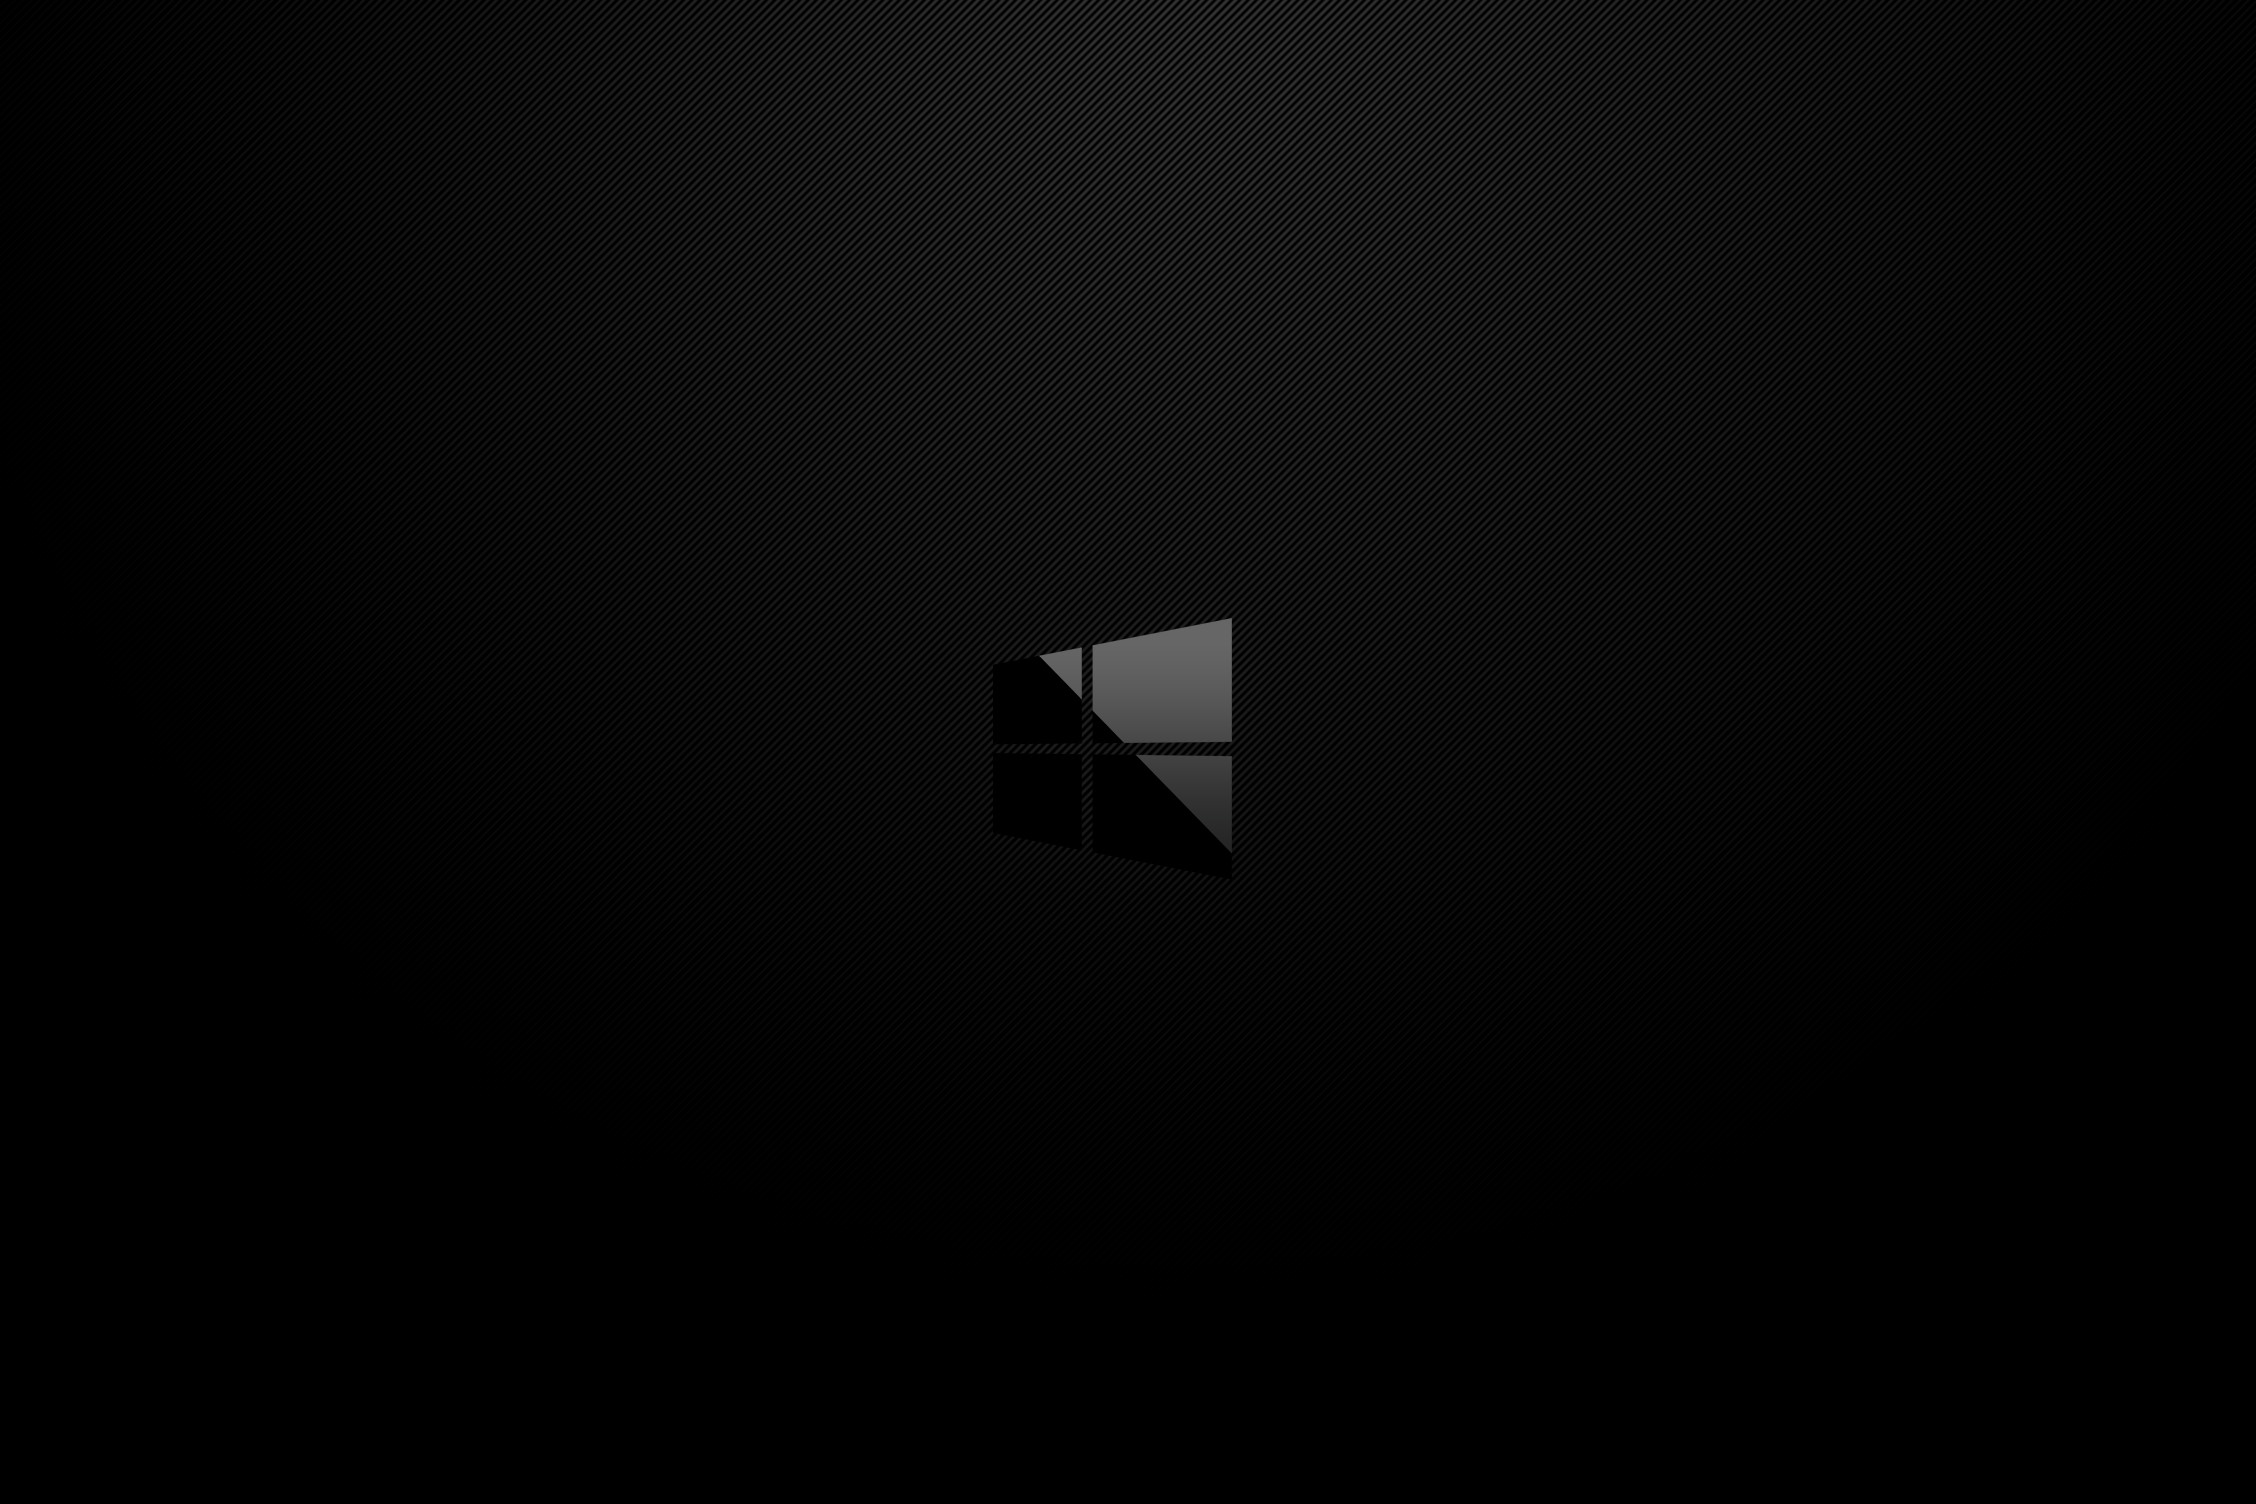 Dark Minimal Wallpaper (83+ images)